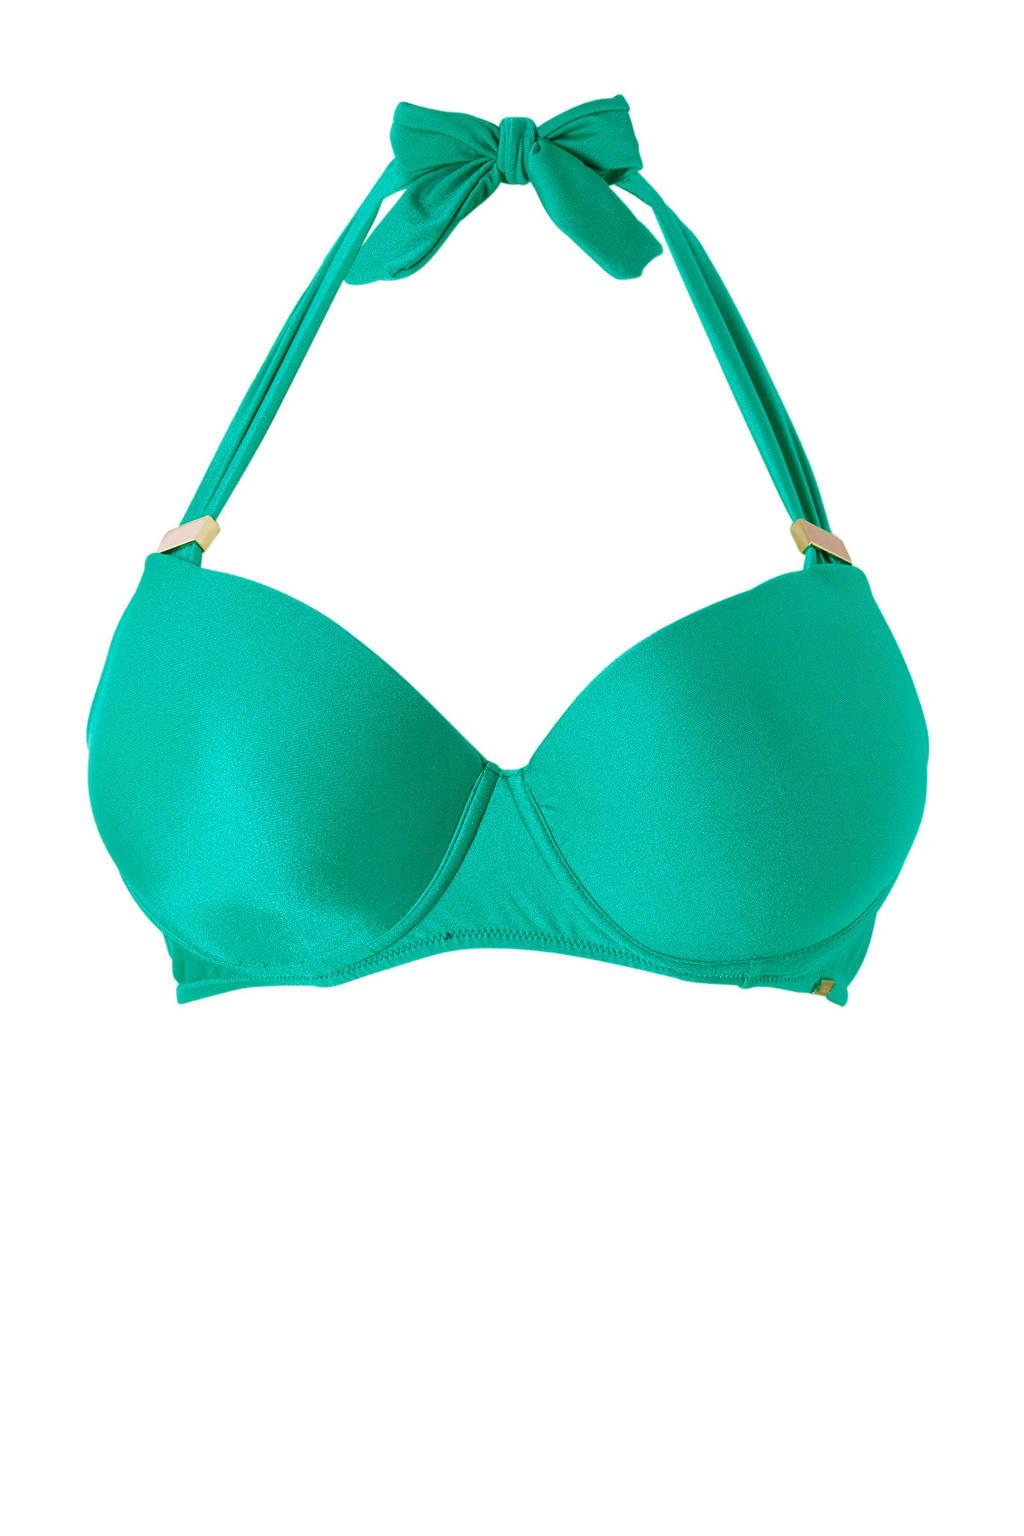 Sapphhalter Groen Riviera Groen Sapphhalter Groen Bikinitop Riviera Bikinitop Sapphhalter Sapphhalter Bikinitop Bikinitop Bikinitop Sapphhalter Groen Riviera Riviera nxapWW